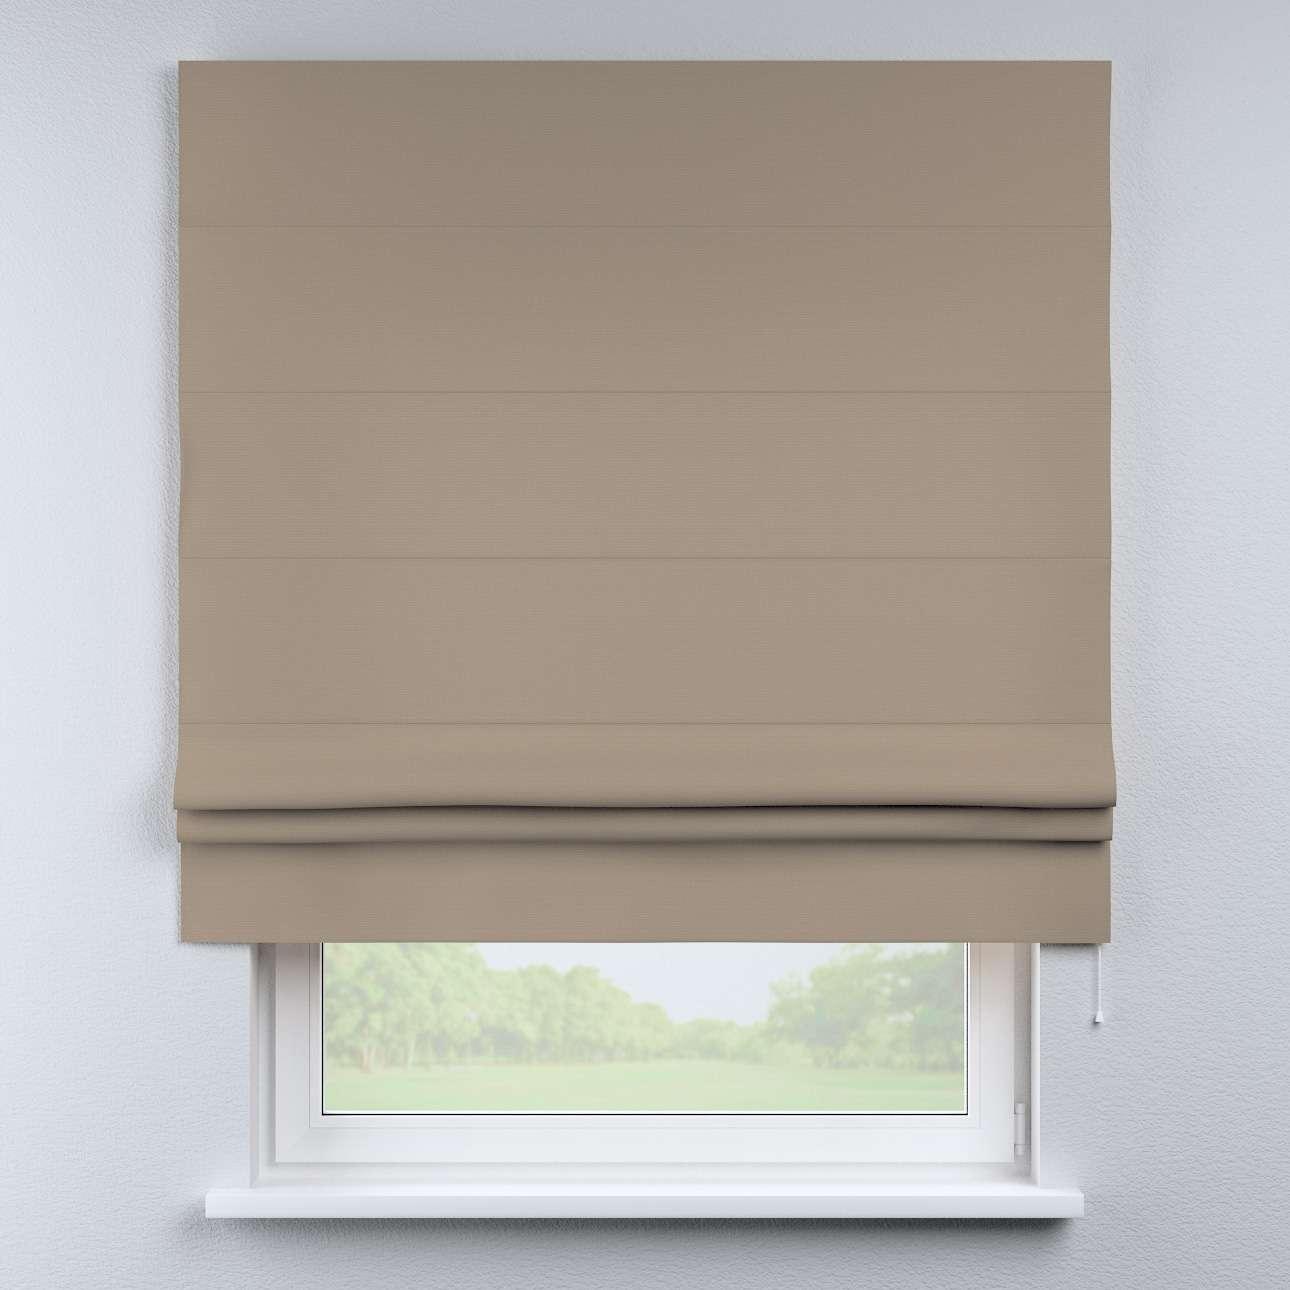 Foldegardin Paris<br/>Med lige flæse 80 × 170 cm fra kollektionen Cotton Panama, Stof: 702-28